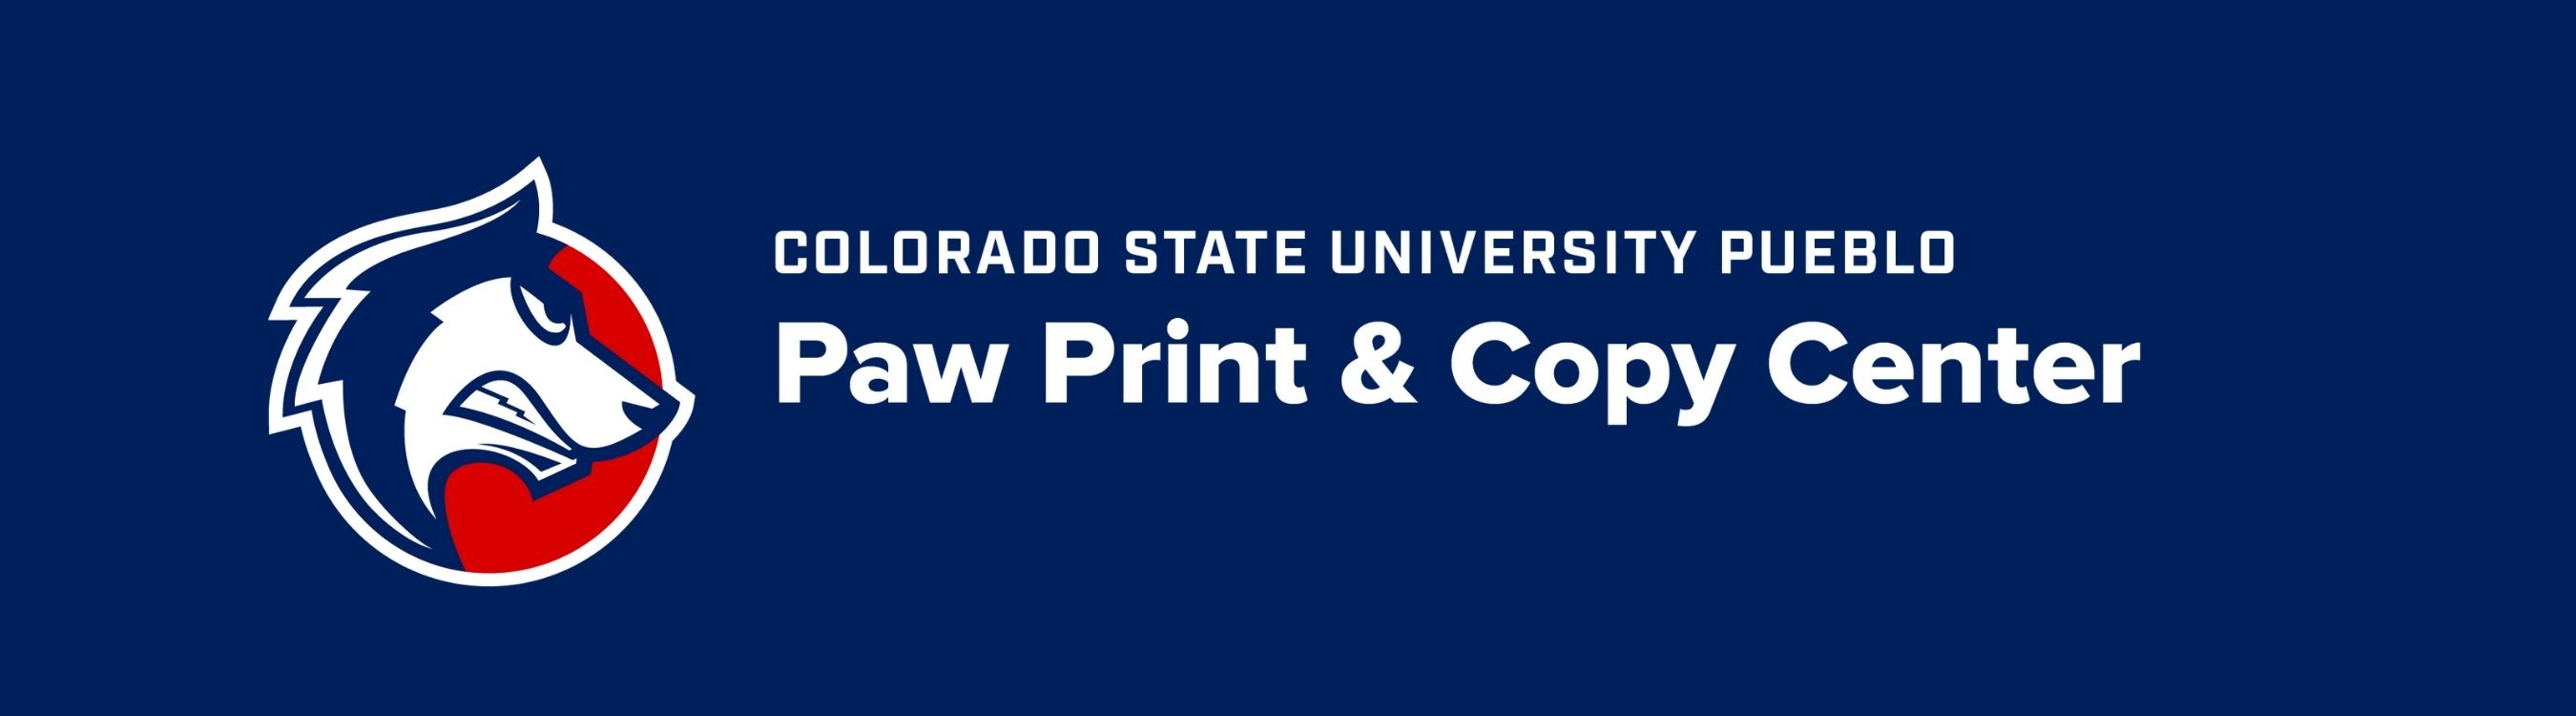 PAW Print & Copy Center